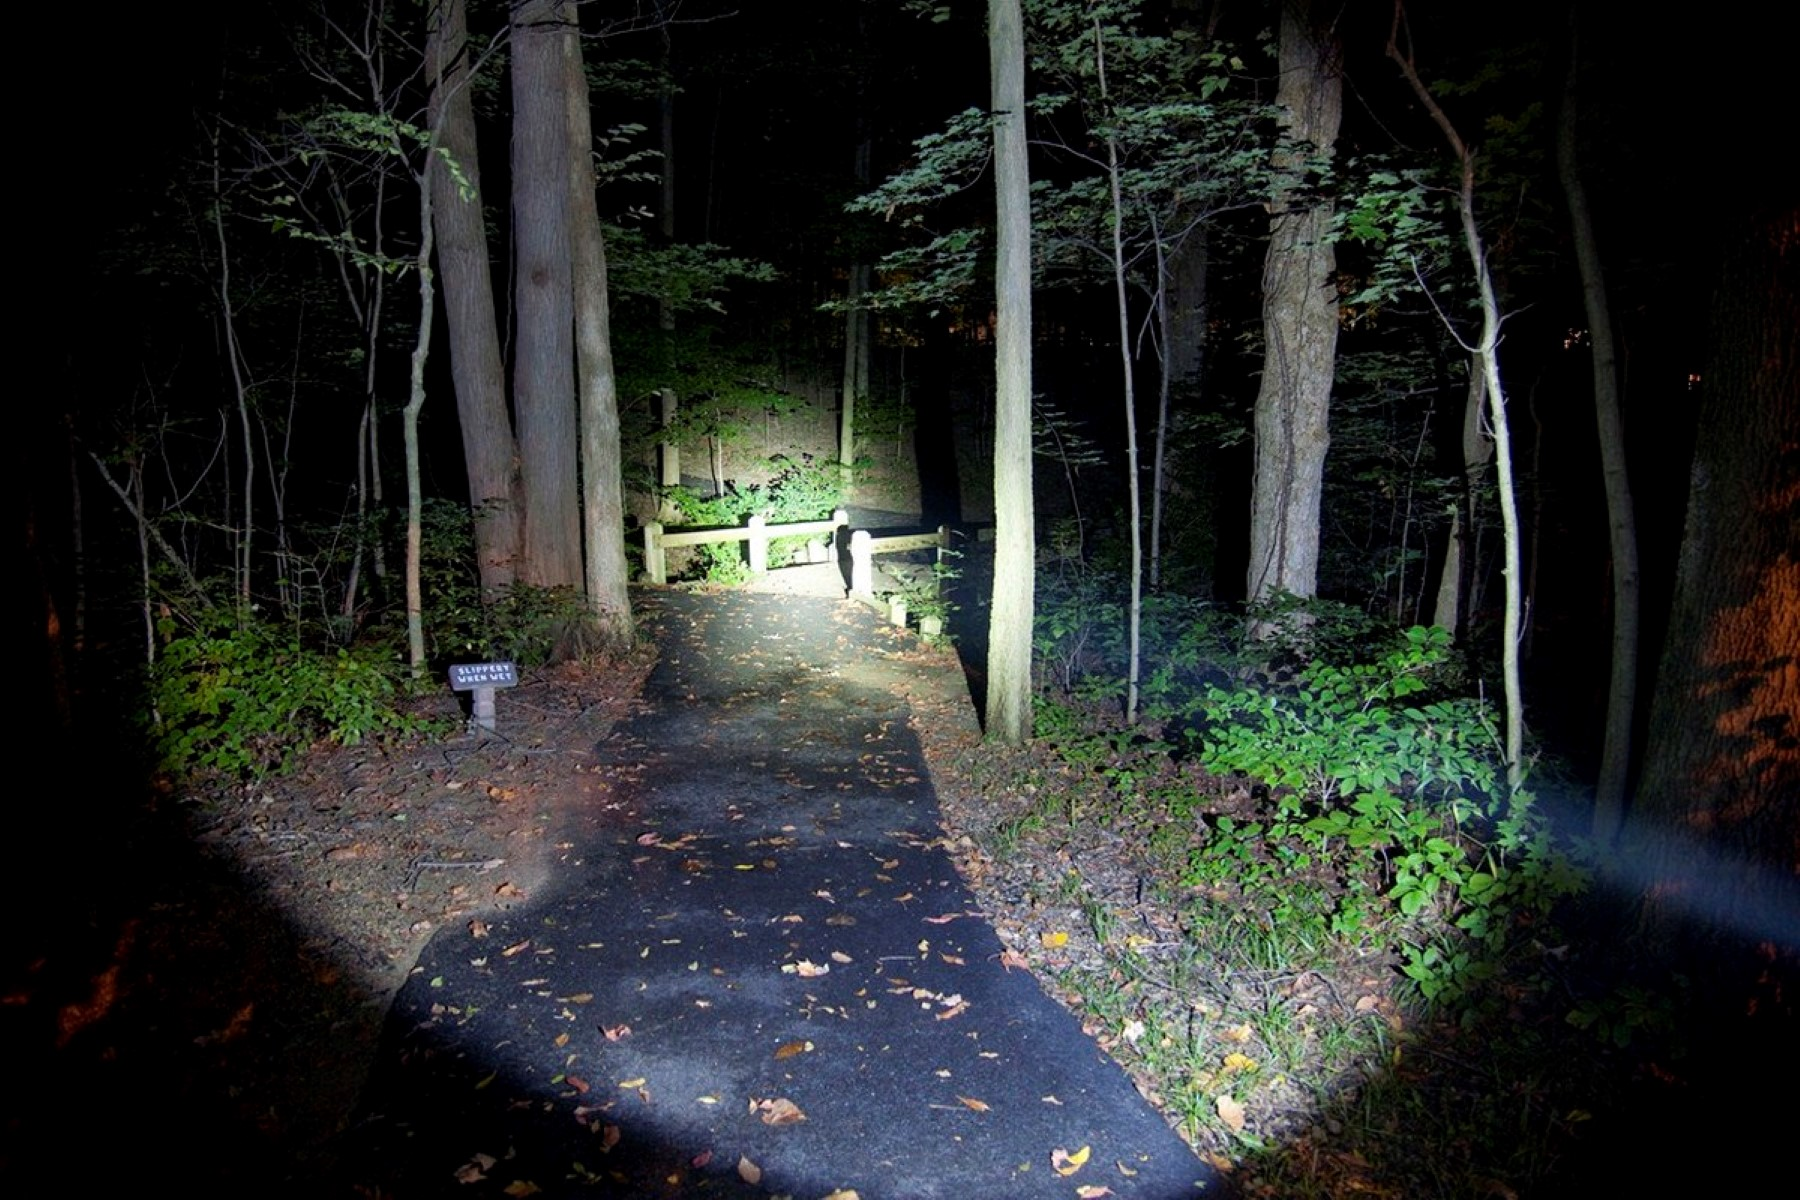 Choosing the Right Flashlight